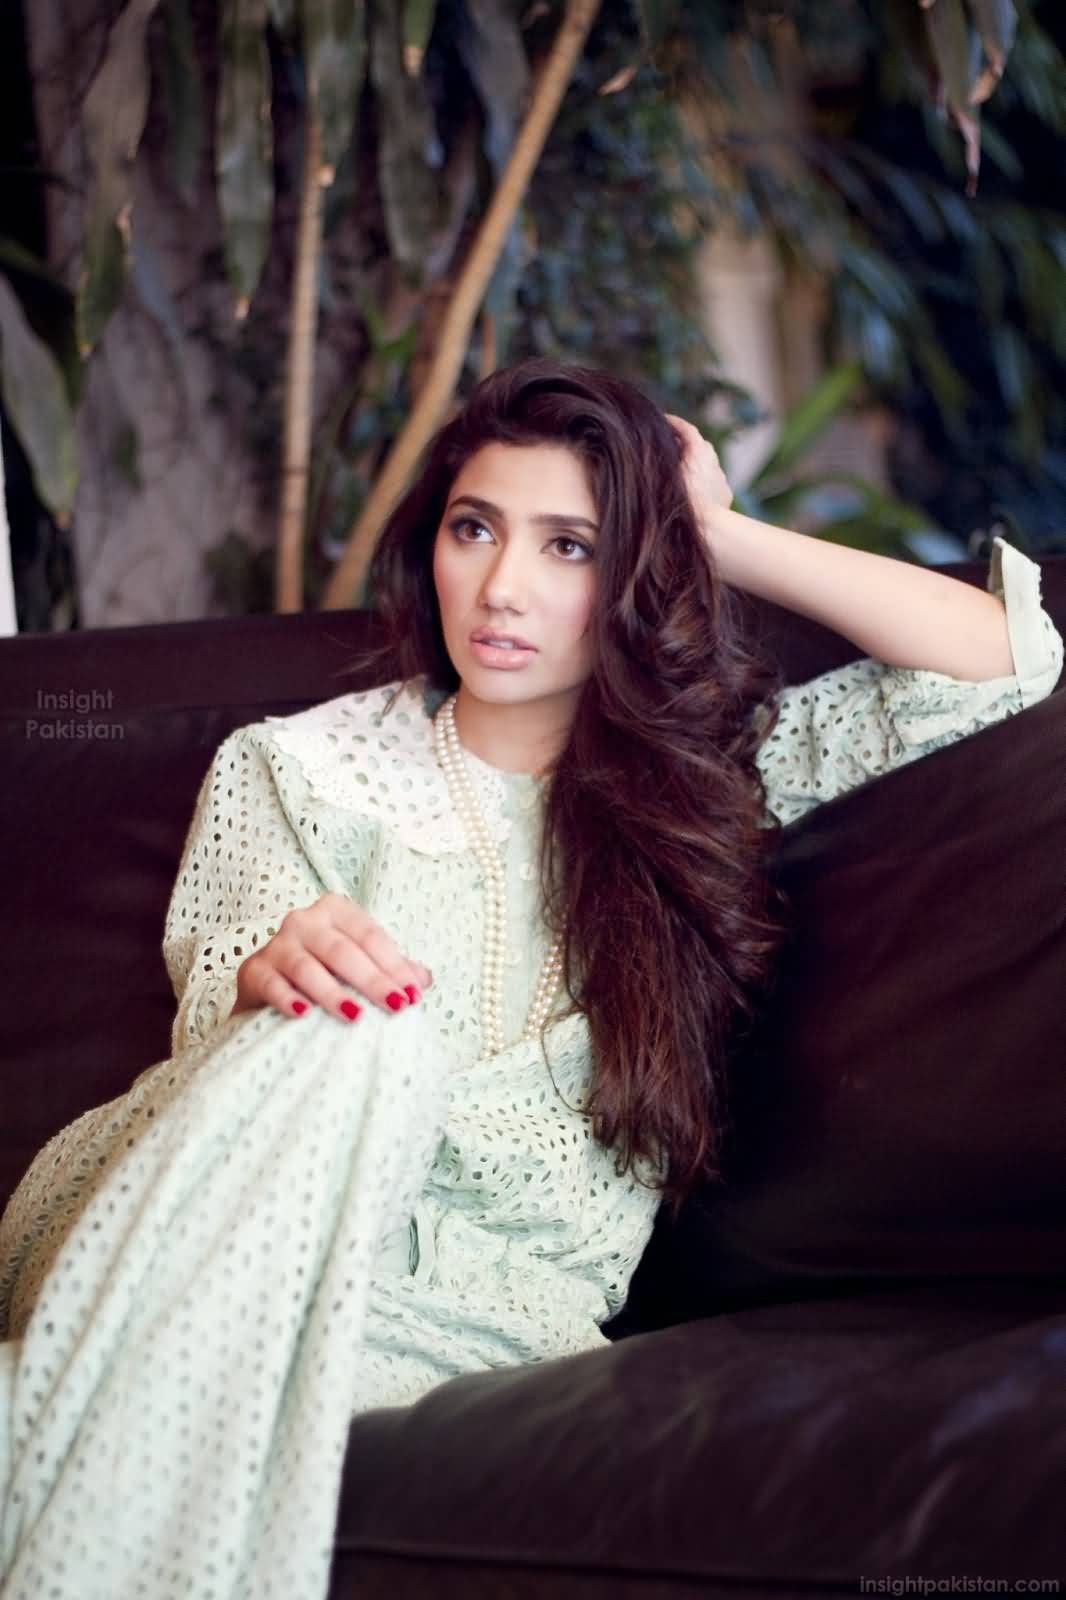 mind blowing mahira khan sitting on sofa